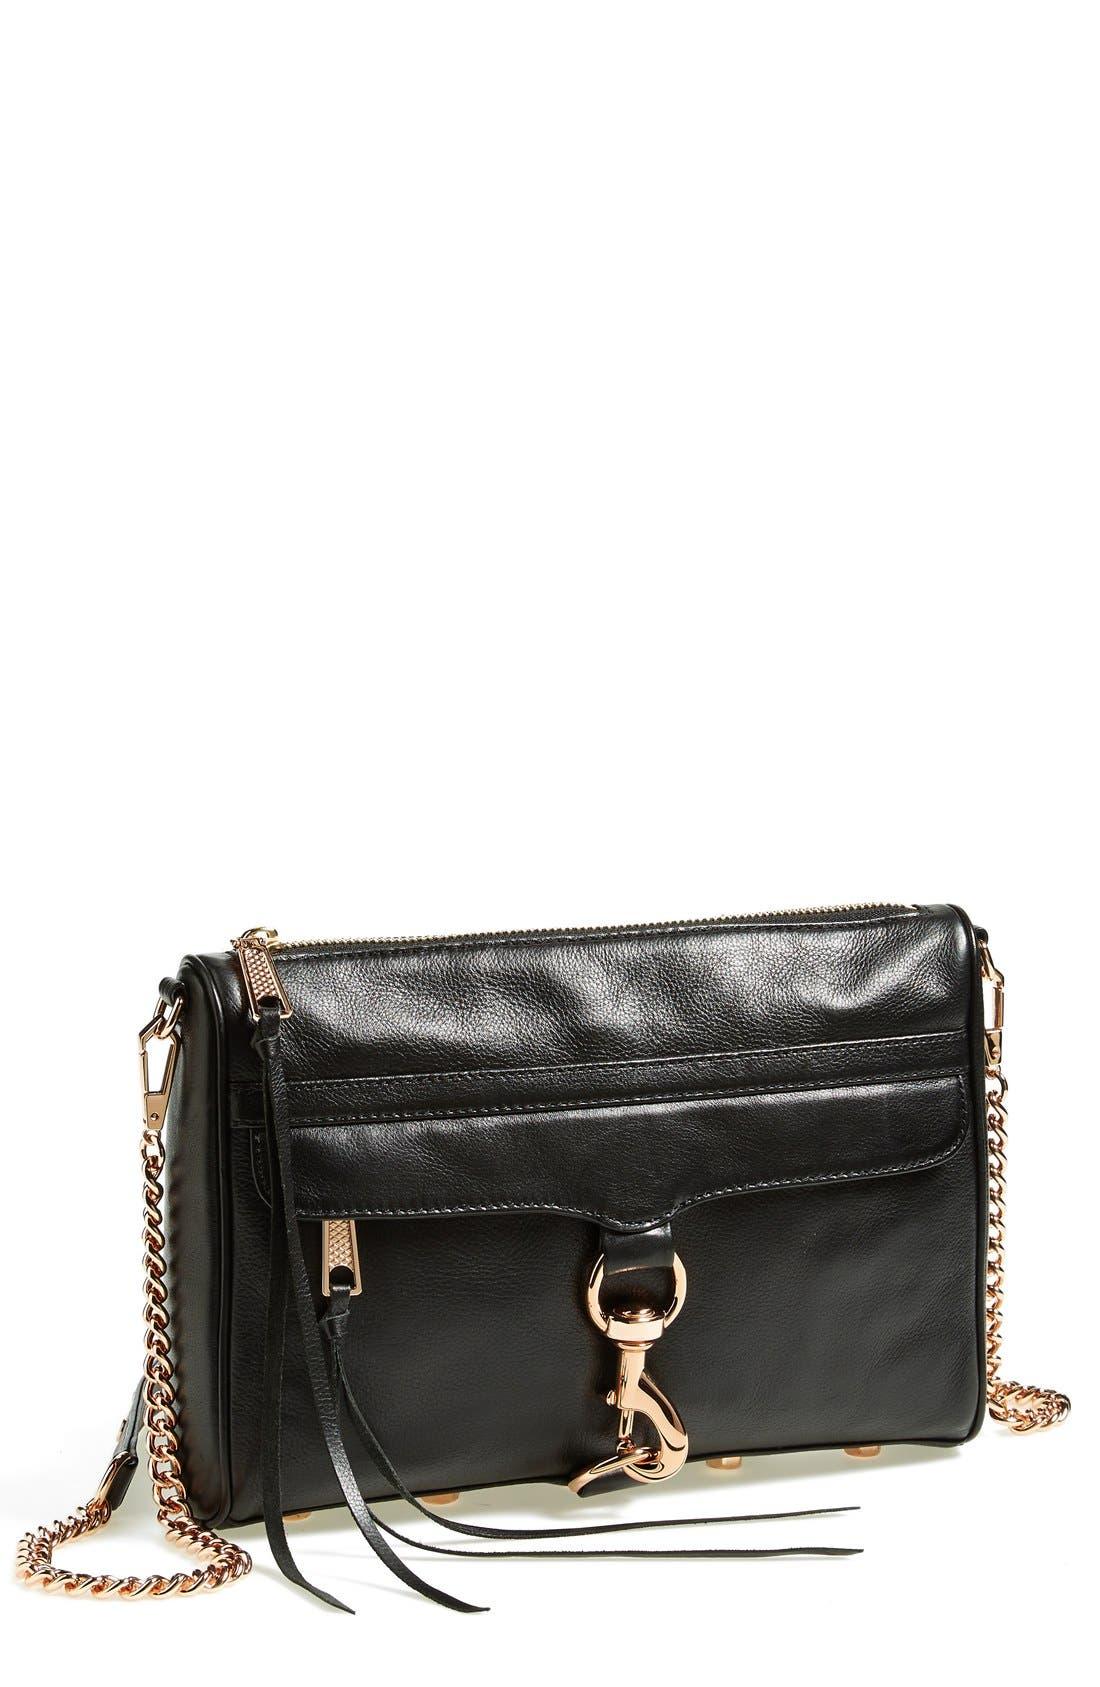 REBECCA MINKOFF 'MAC Clutch' Crossbody Bag, Main, color, 001